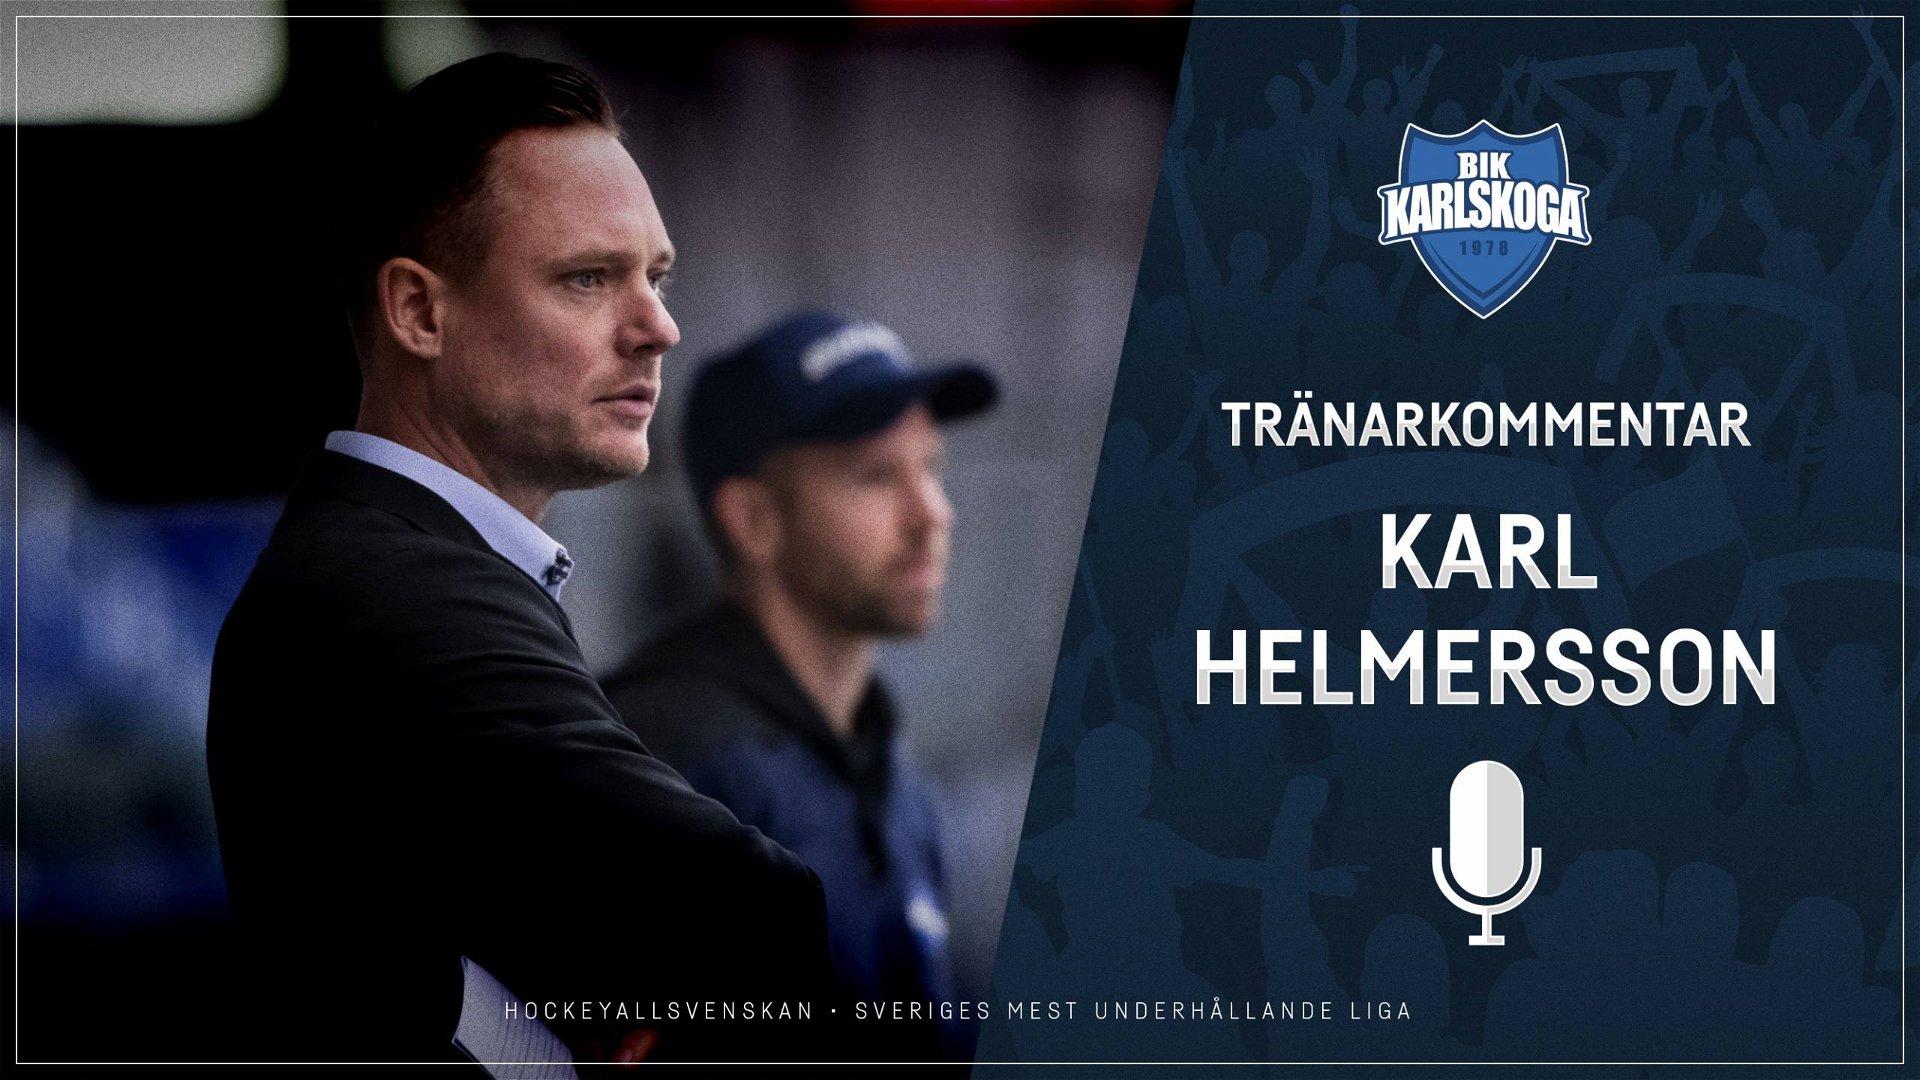 2021-01-09 Segerintervju: Karl Helmersson